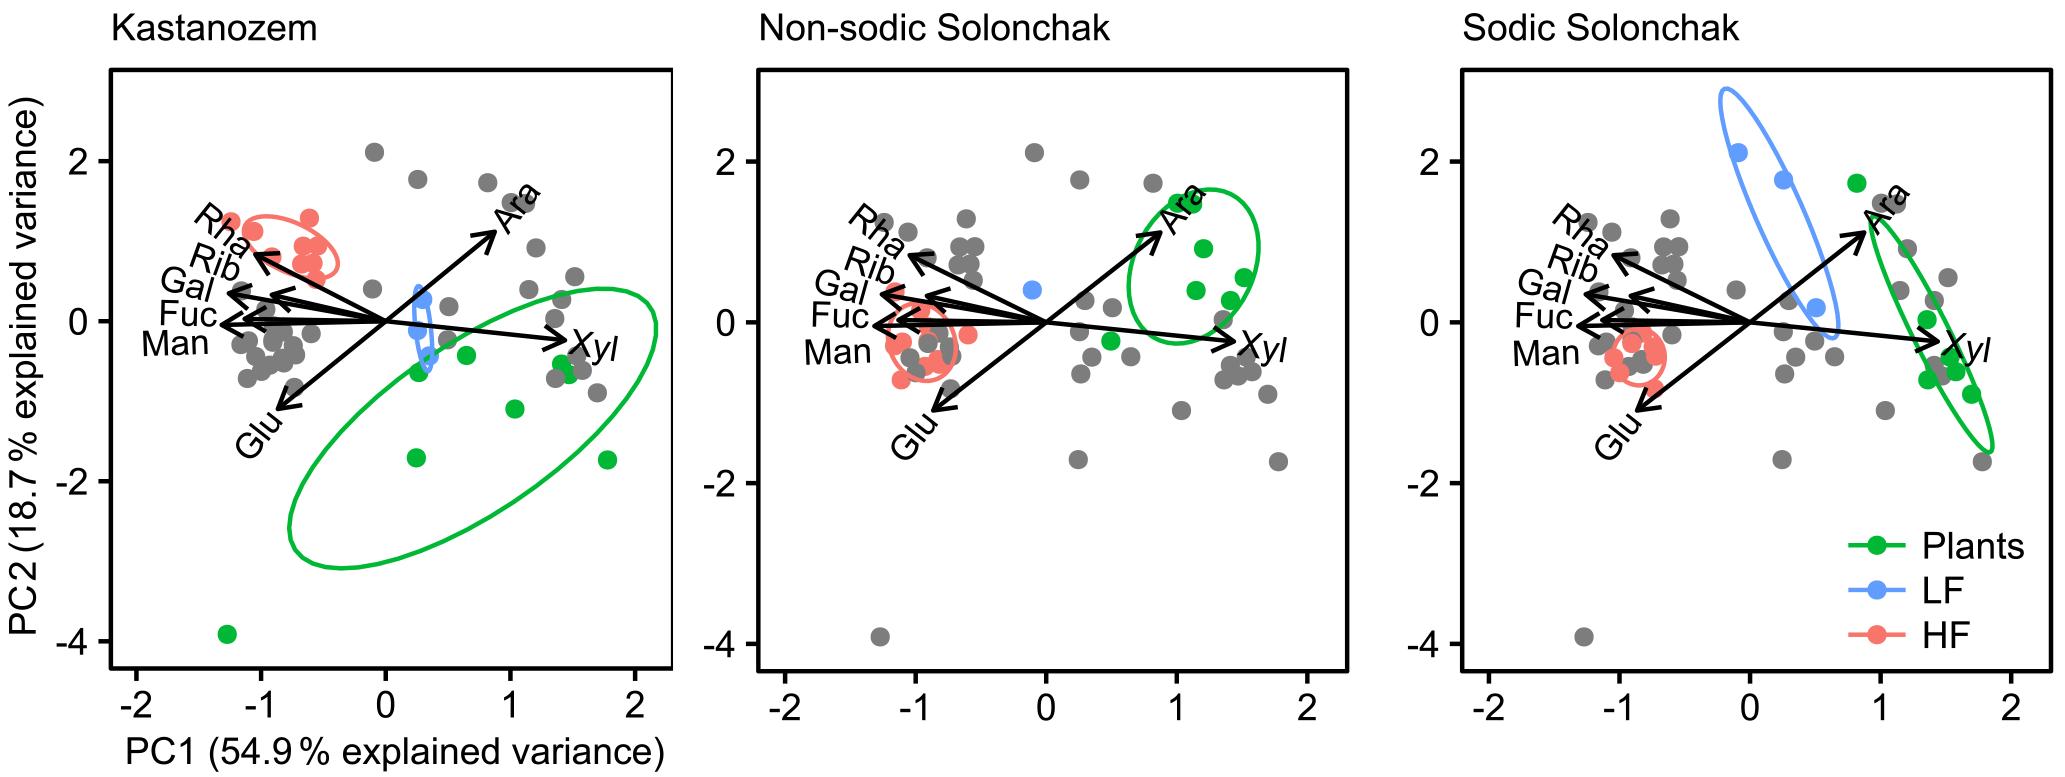 BG - Organic matter dynamics along a salinity gradient in